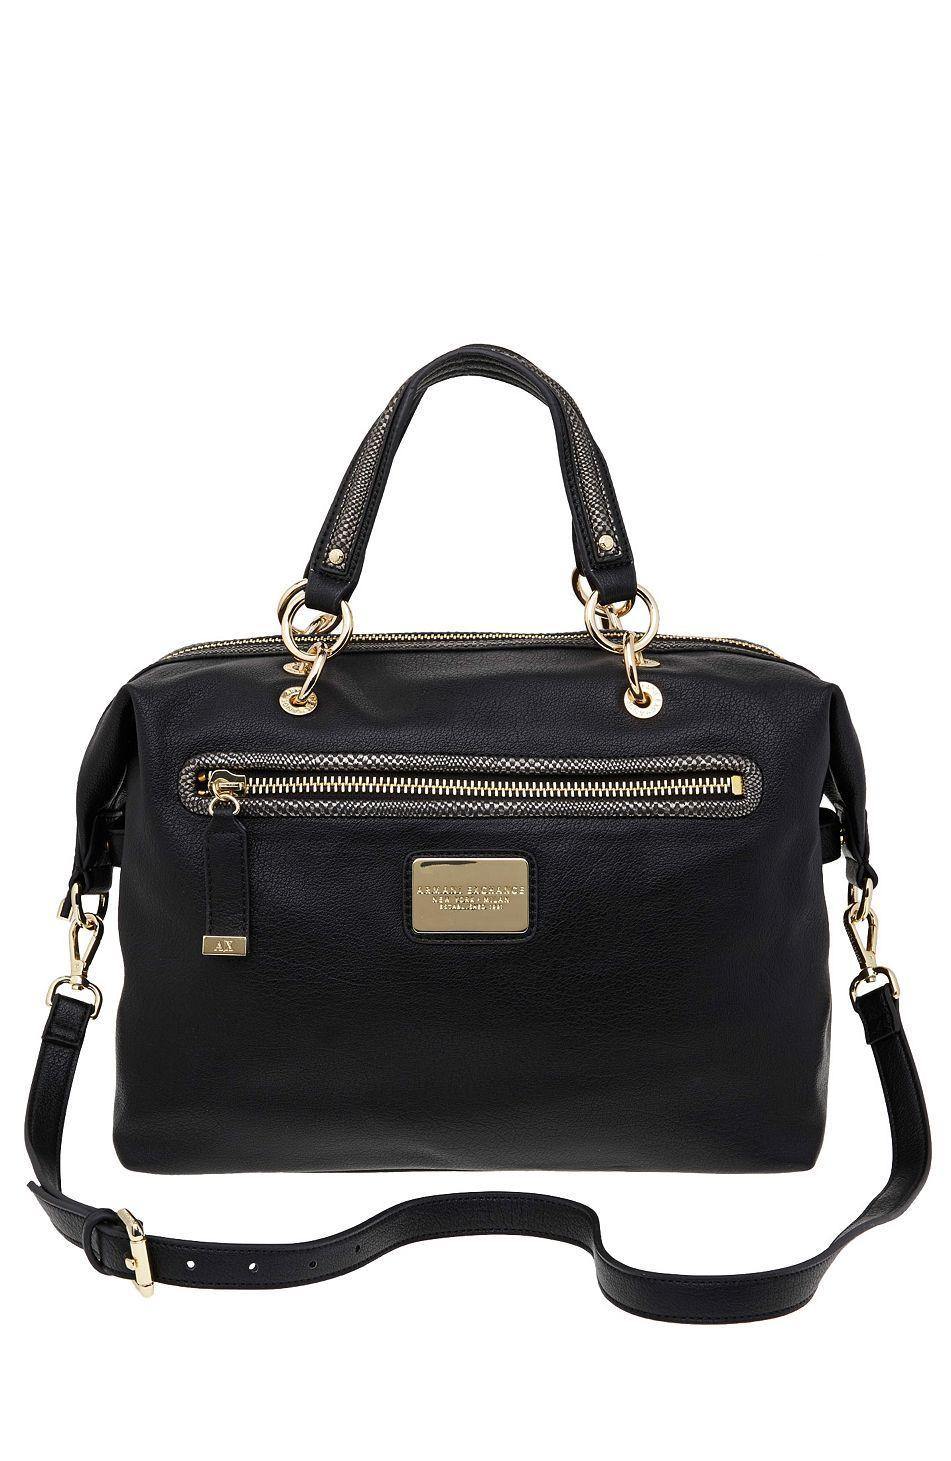 0c16cd30776 Slouchy Crossbody Satchel - Handbags - Accessories - Armani Exchange ·  Handbag AccessoriesClothing ...